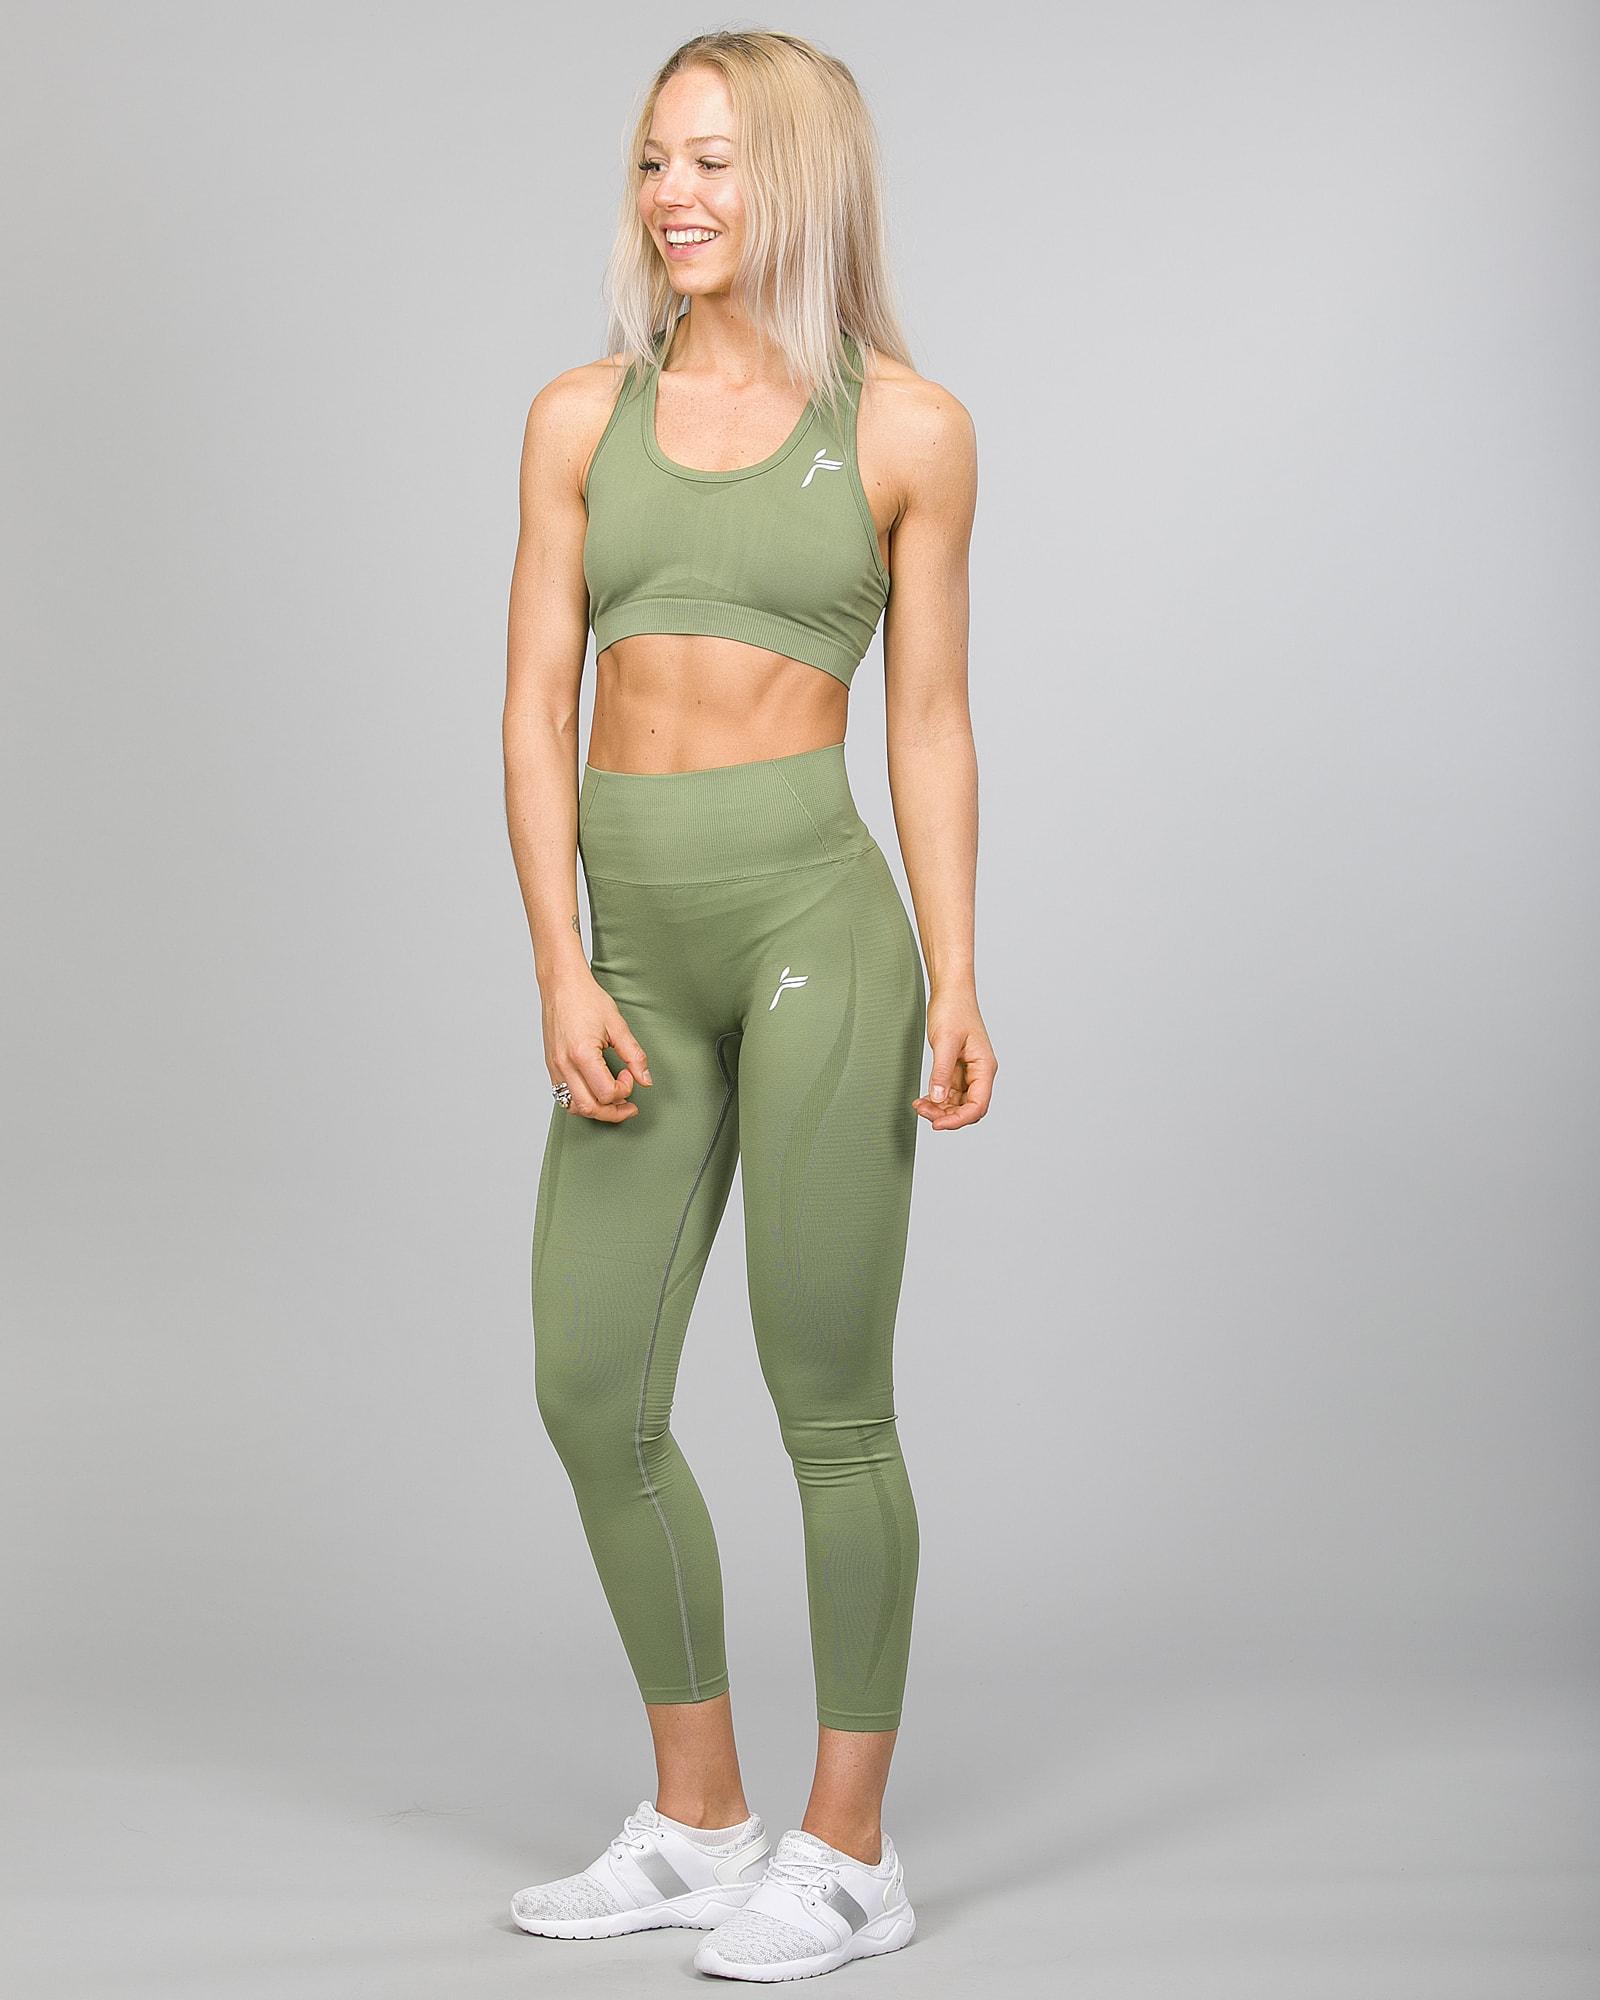 Famme Vortex Legging vhwl-ag and Drop It Sports Bra disb-ag Army Green b